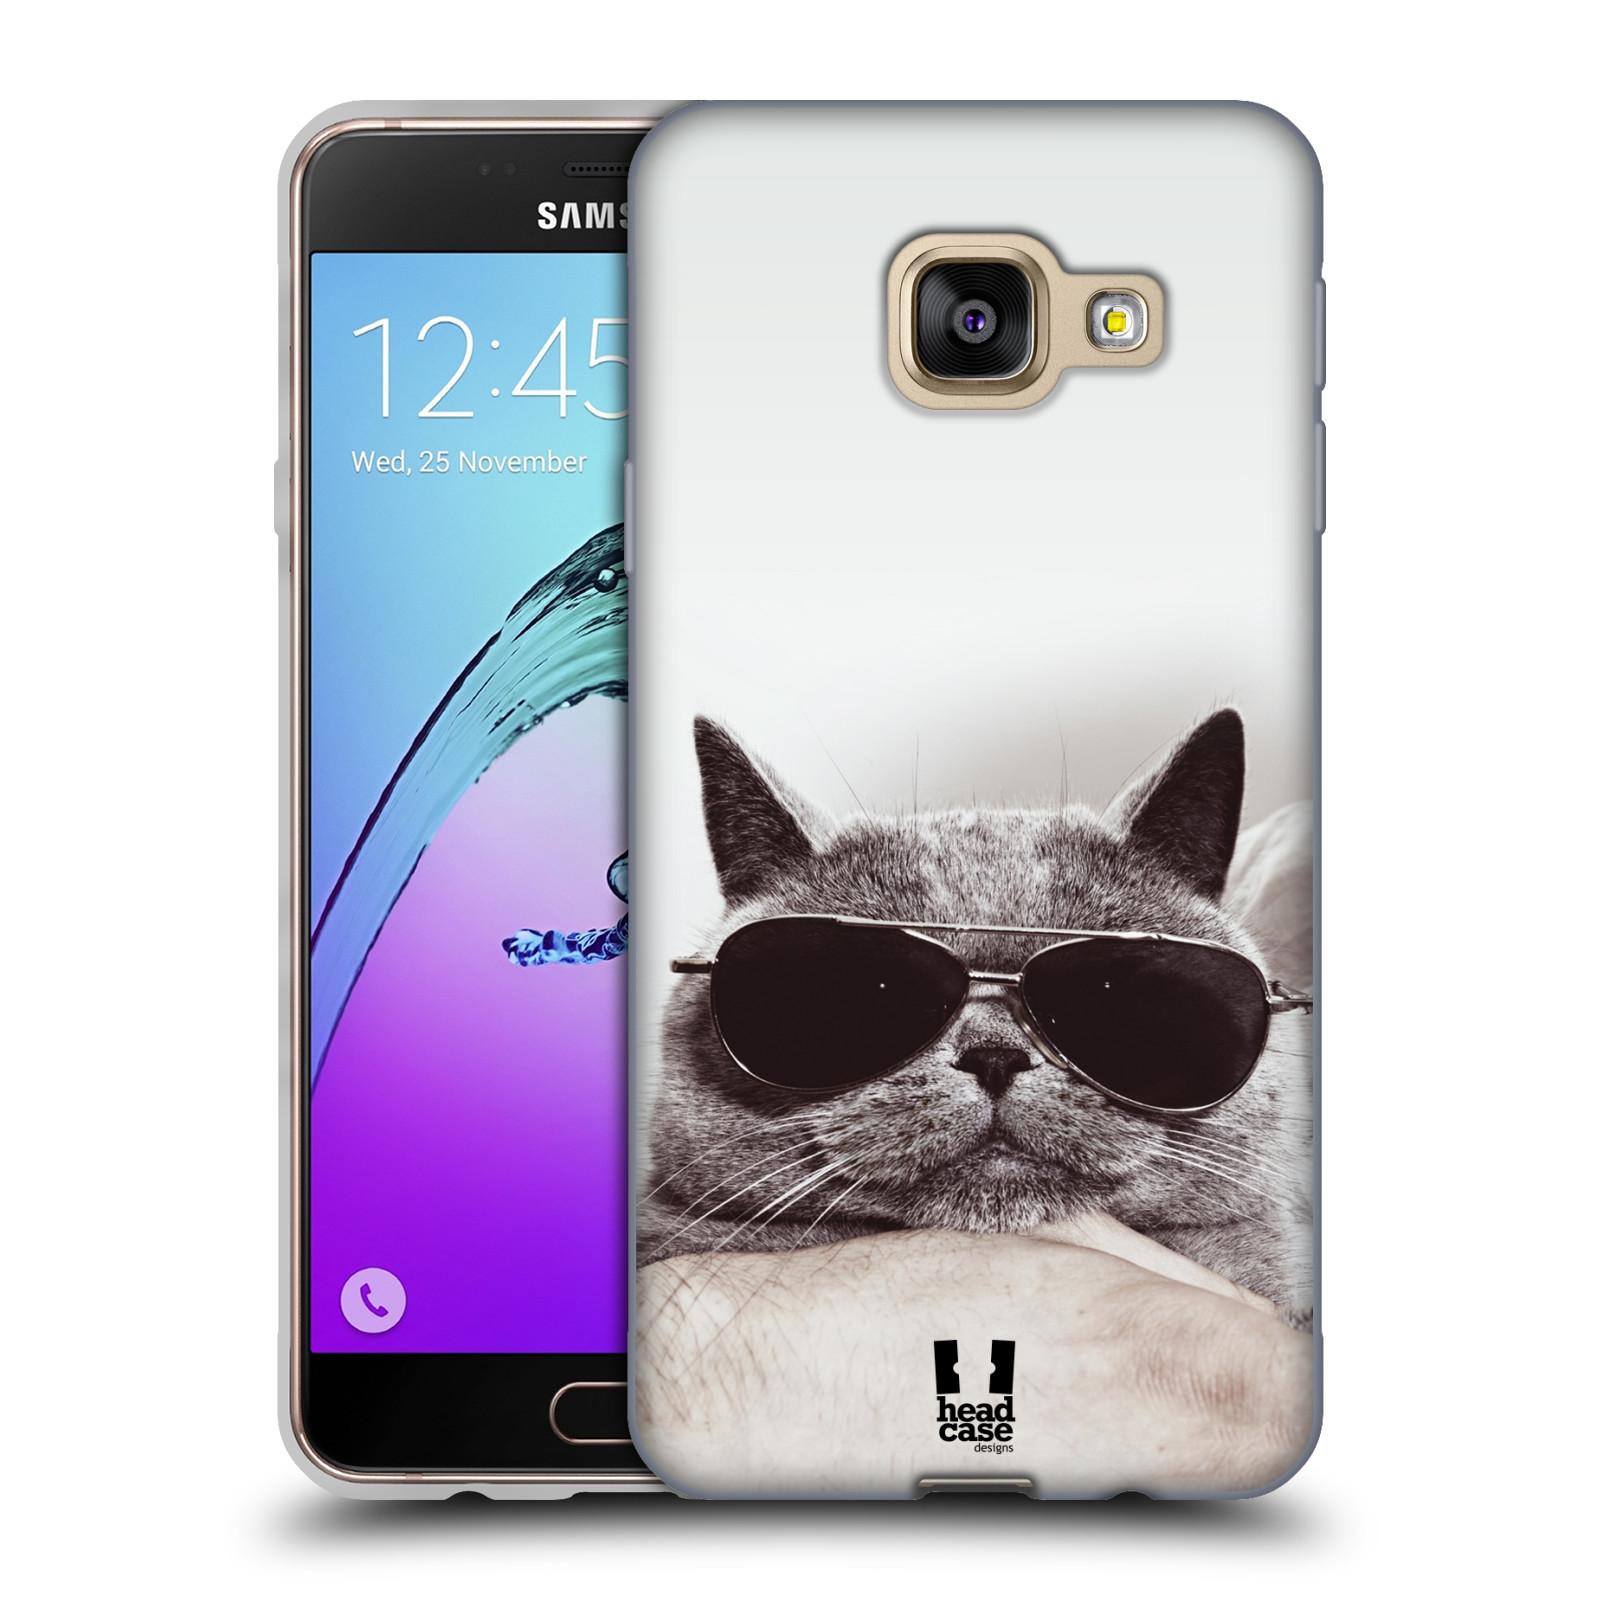 Silikonové pouzdro na mobil Samsung Galaxy A3 (2016) HEAD CASE KOTĚ S BRÝLEMI (Silikonový kryt či obal na mobilní telefon Samsung Galaxy A3 (2016) SM-A310F)